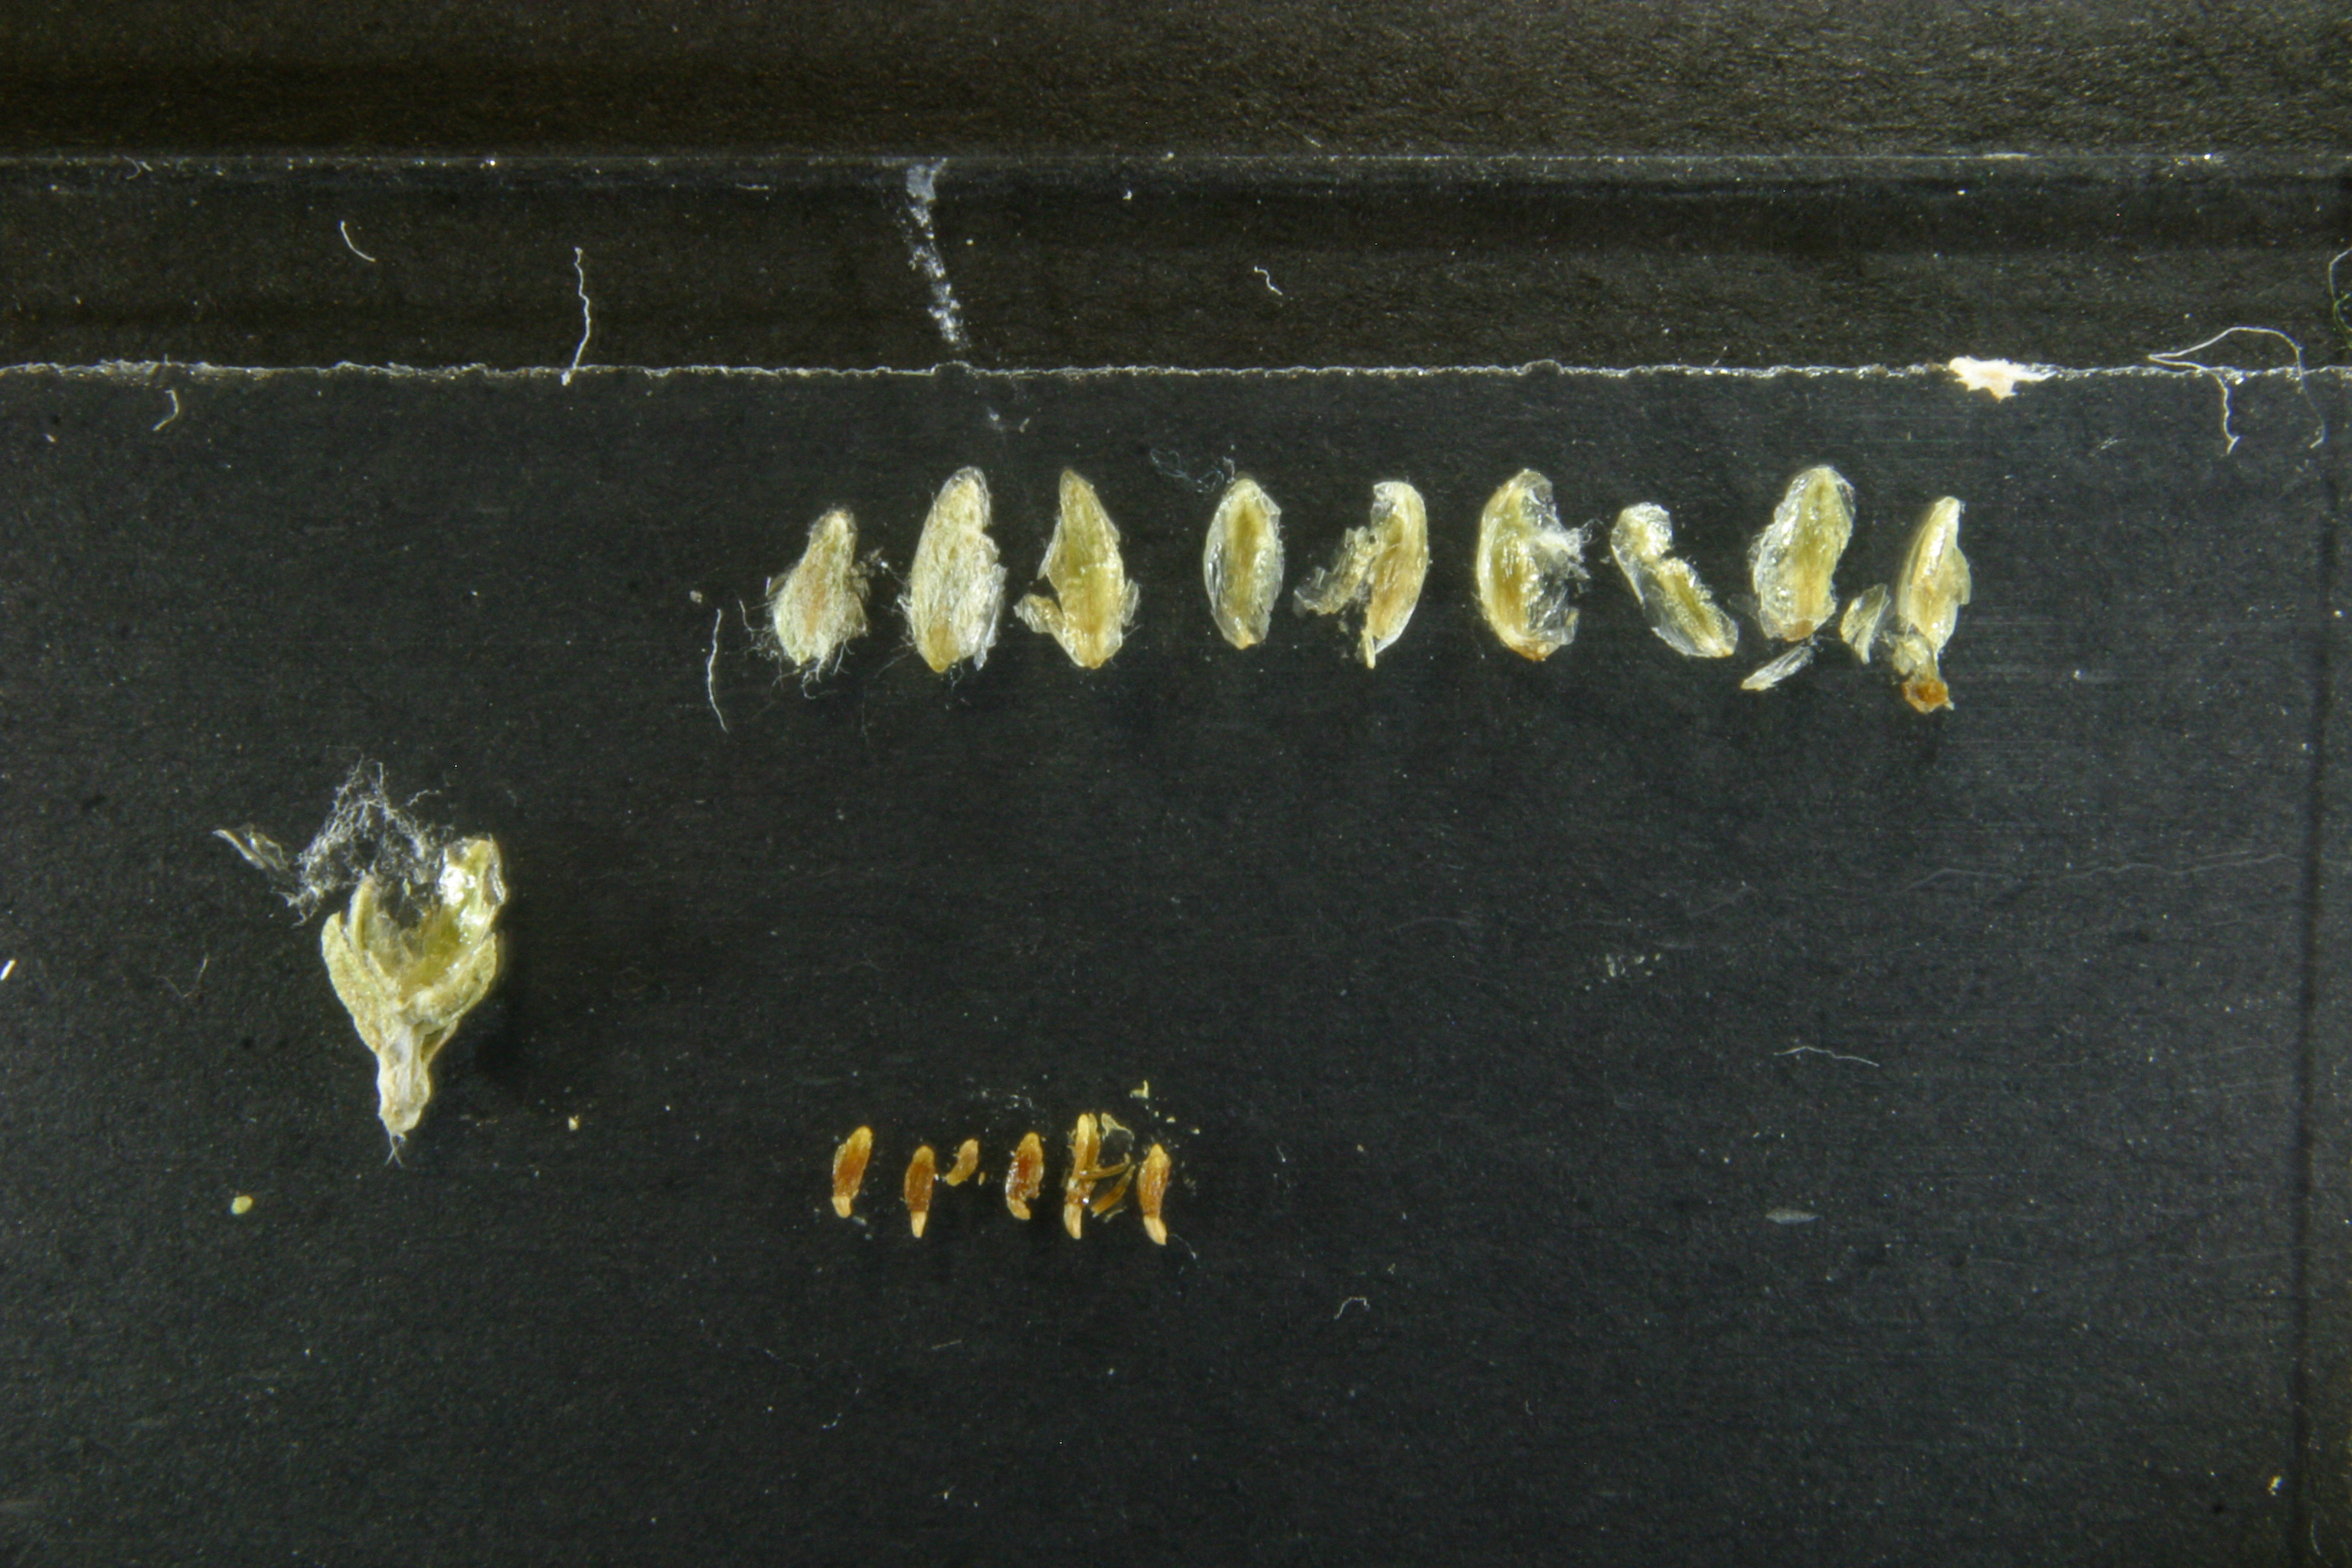 view image: Artemisia mongolorum